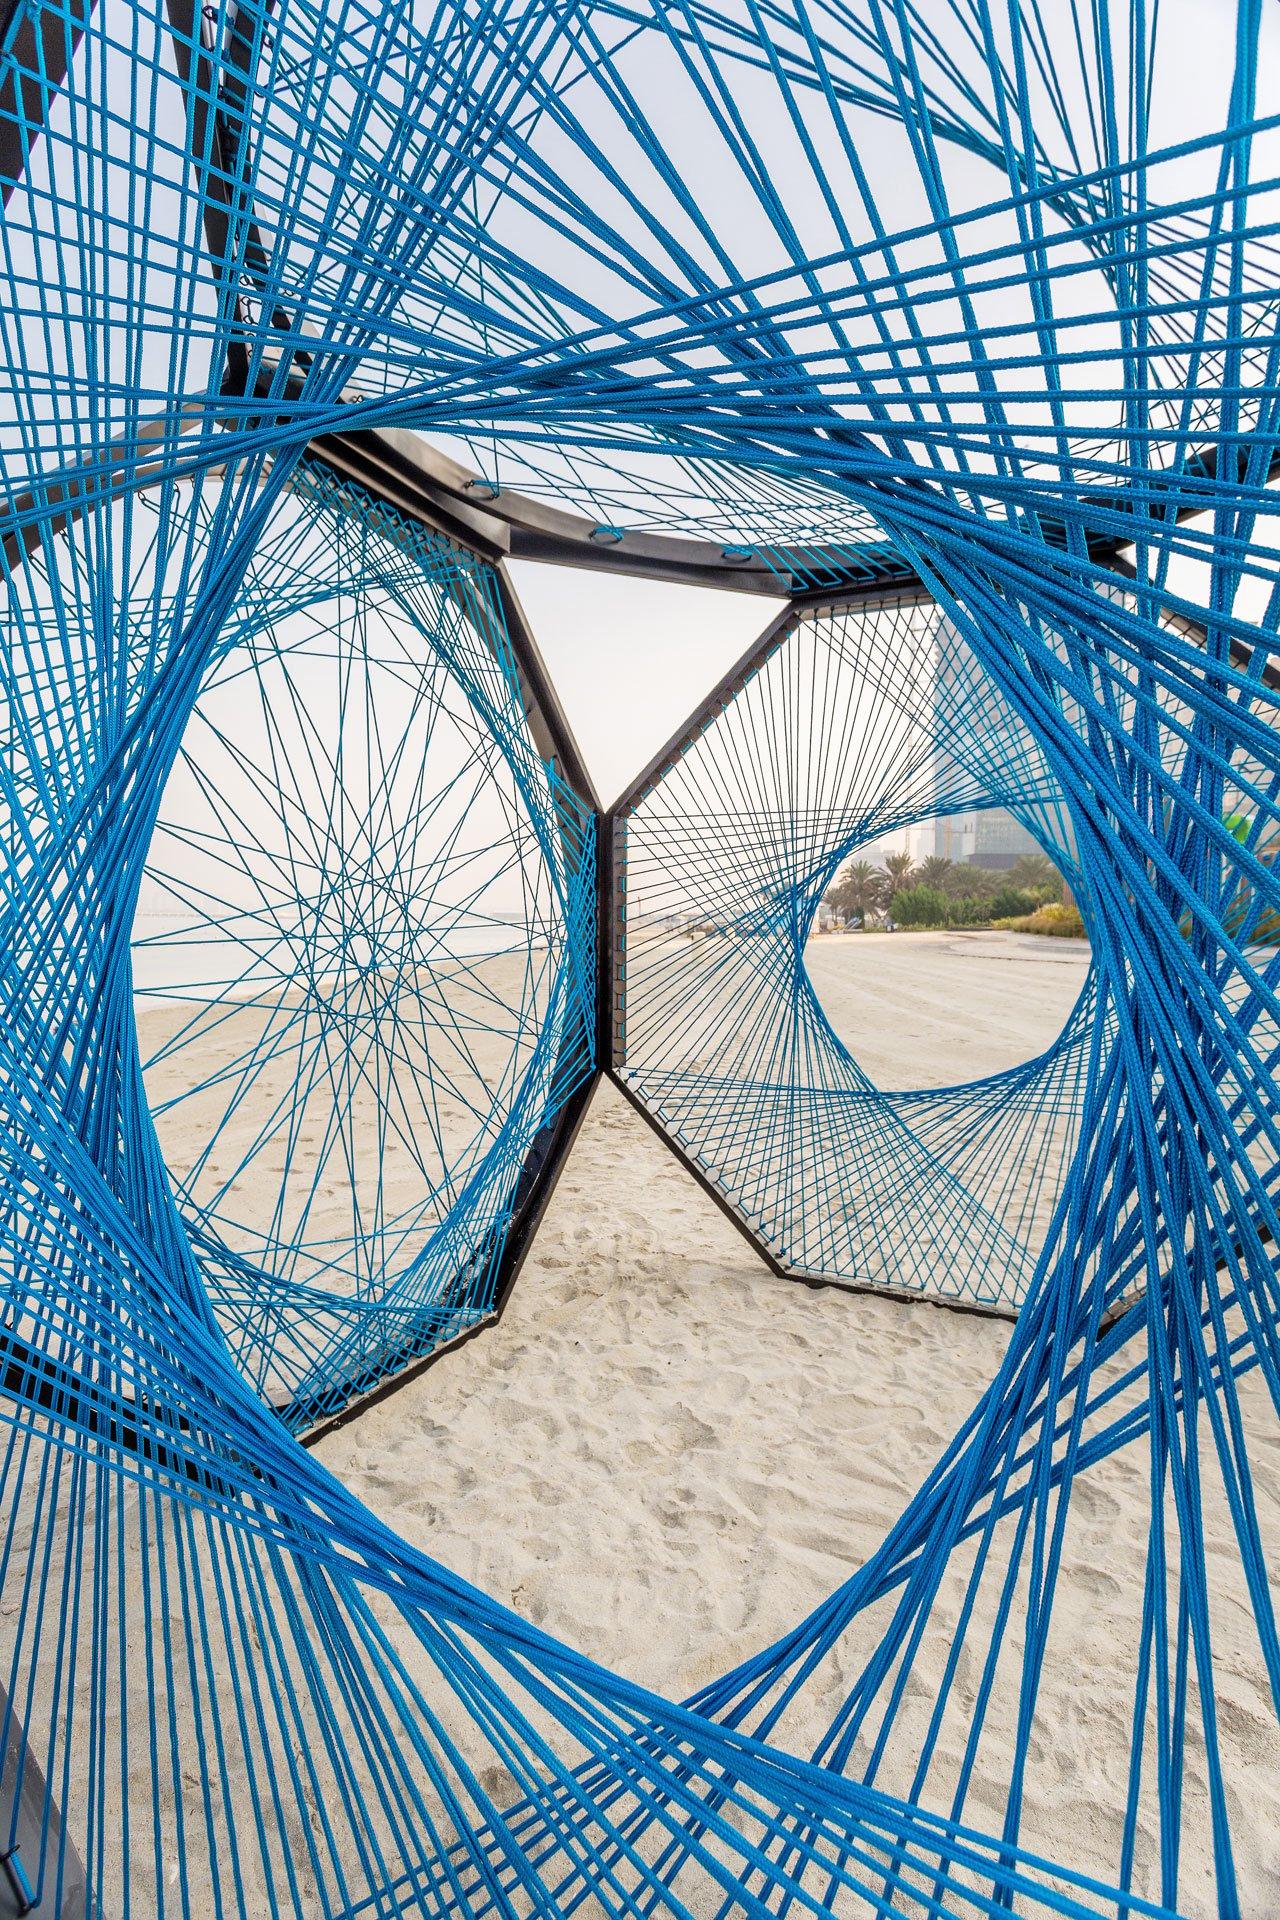 Yaroof installation byAljoud Lootah. AtThe Beach, Opposite JBR, Dubai.